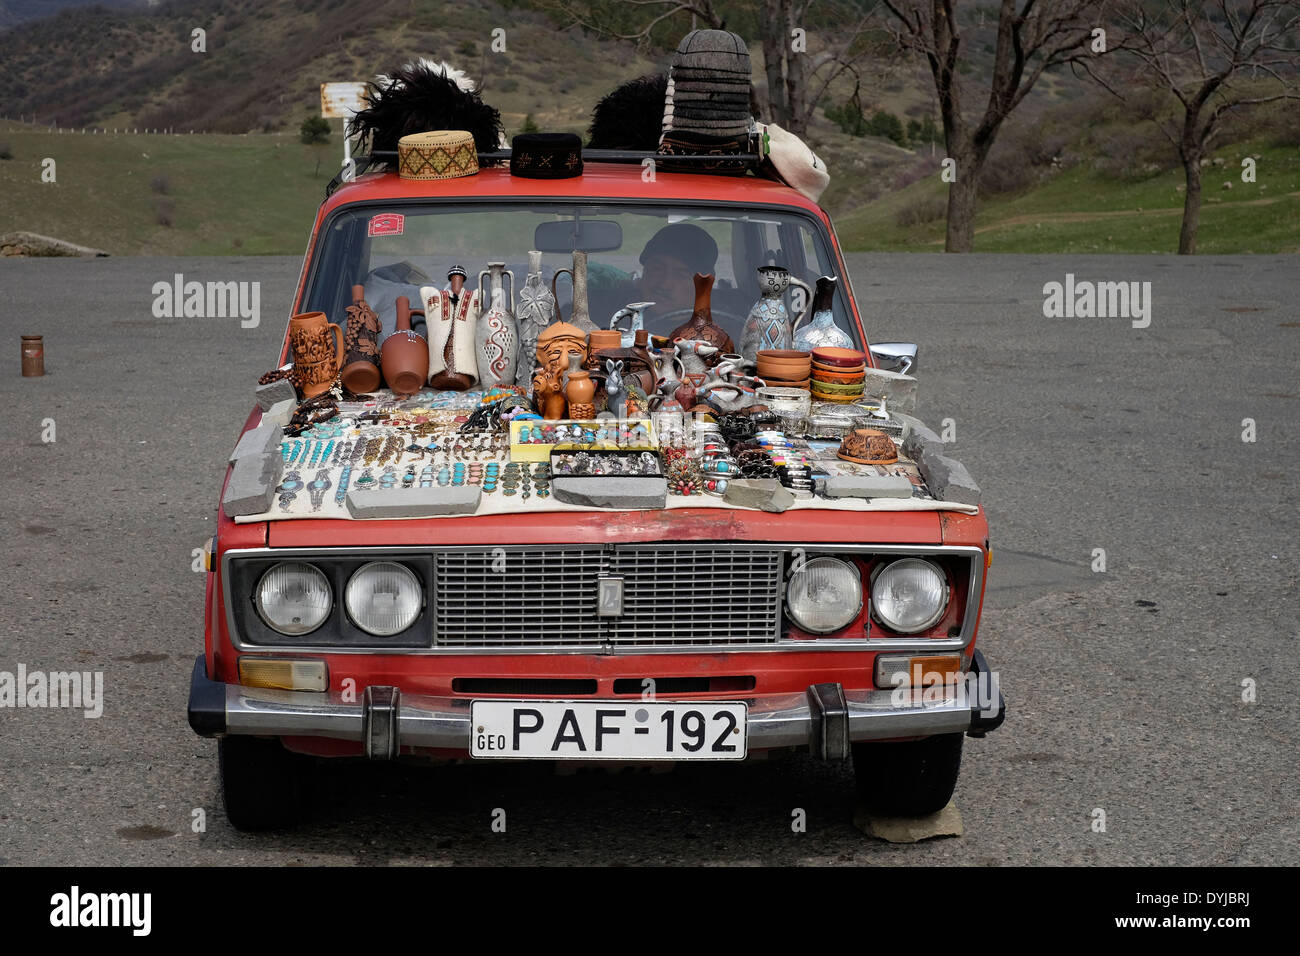 Souvenirs for sale on a hood of a lada car manufactured by the souvenirs for sale on a hood of a lada car manufactured by the russian car manufacturer avtovaz in the republic of georgia sciox Gallery